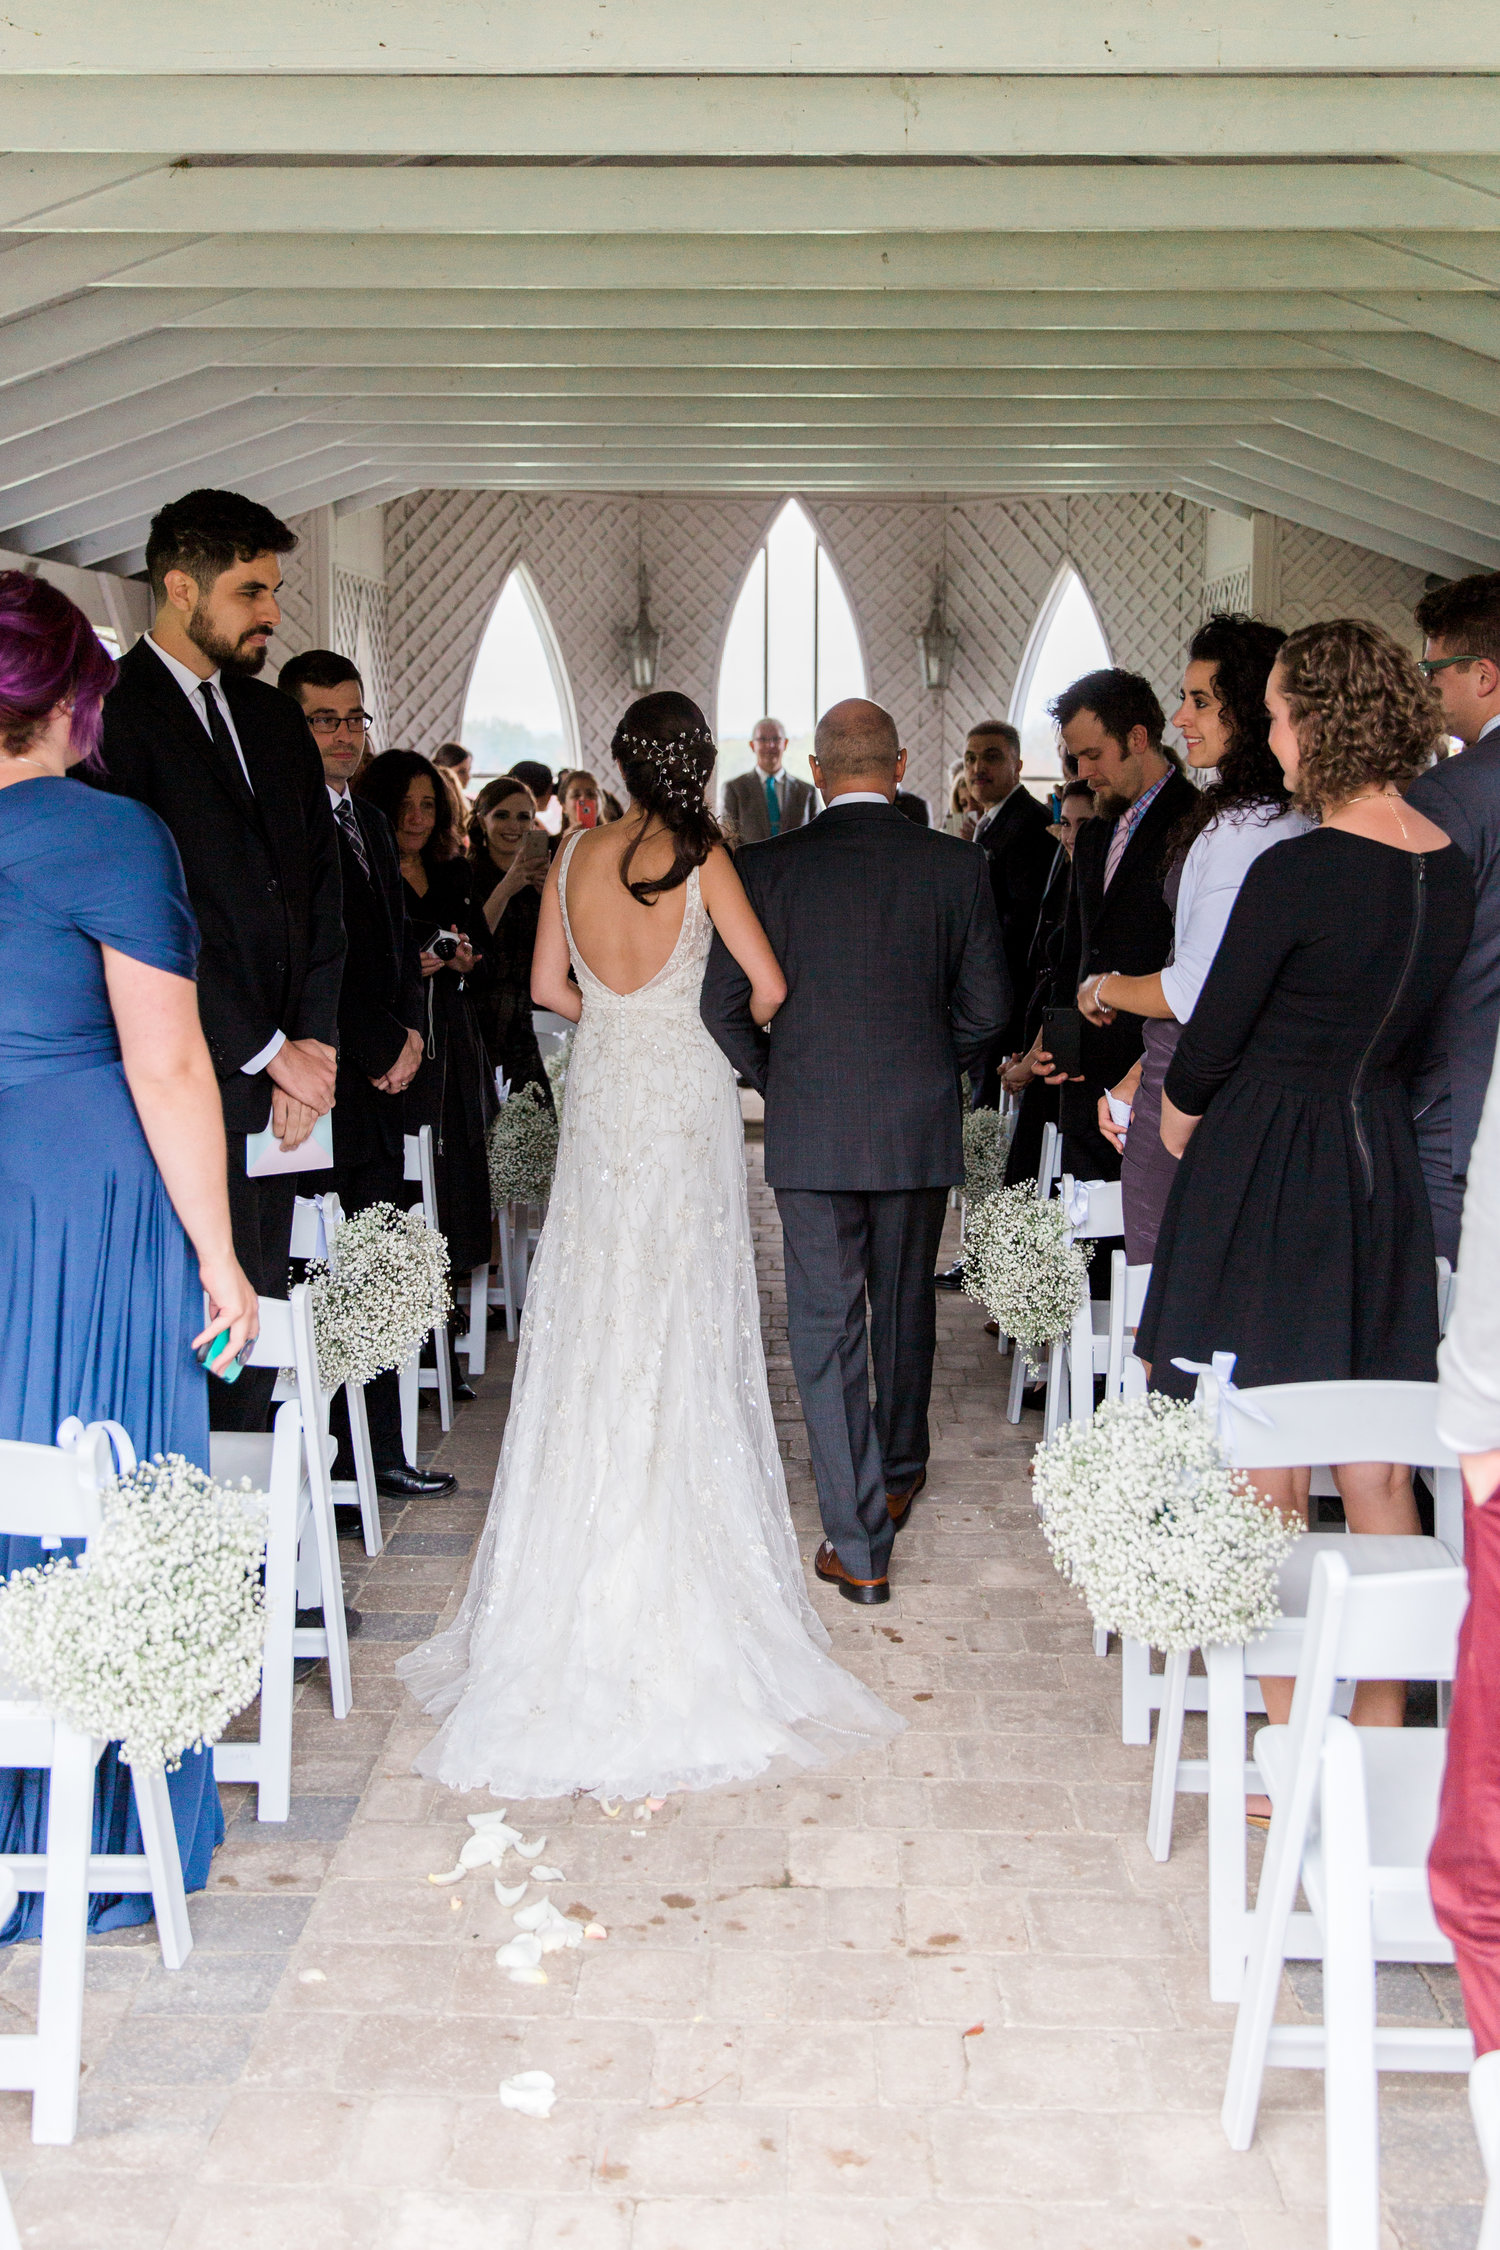 Amir-Golbazi-Danielle-Giroux-Photography_Toronto-Wedding_Cedarwood_Rachel-Paul_166.jpg